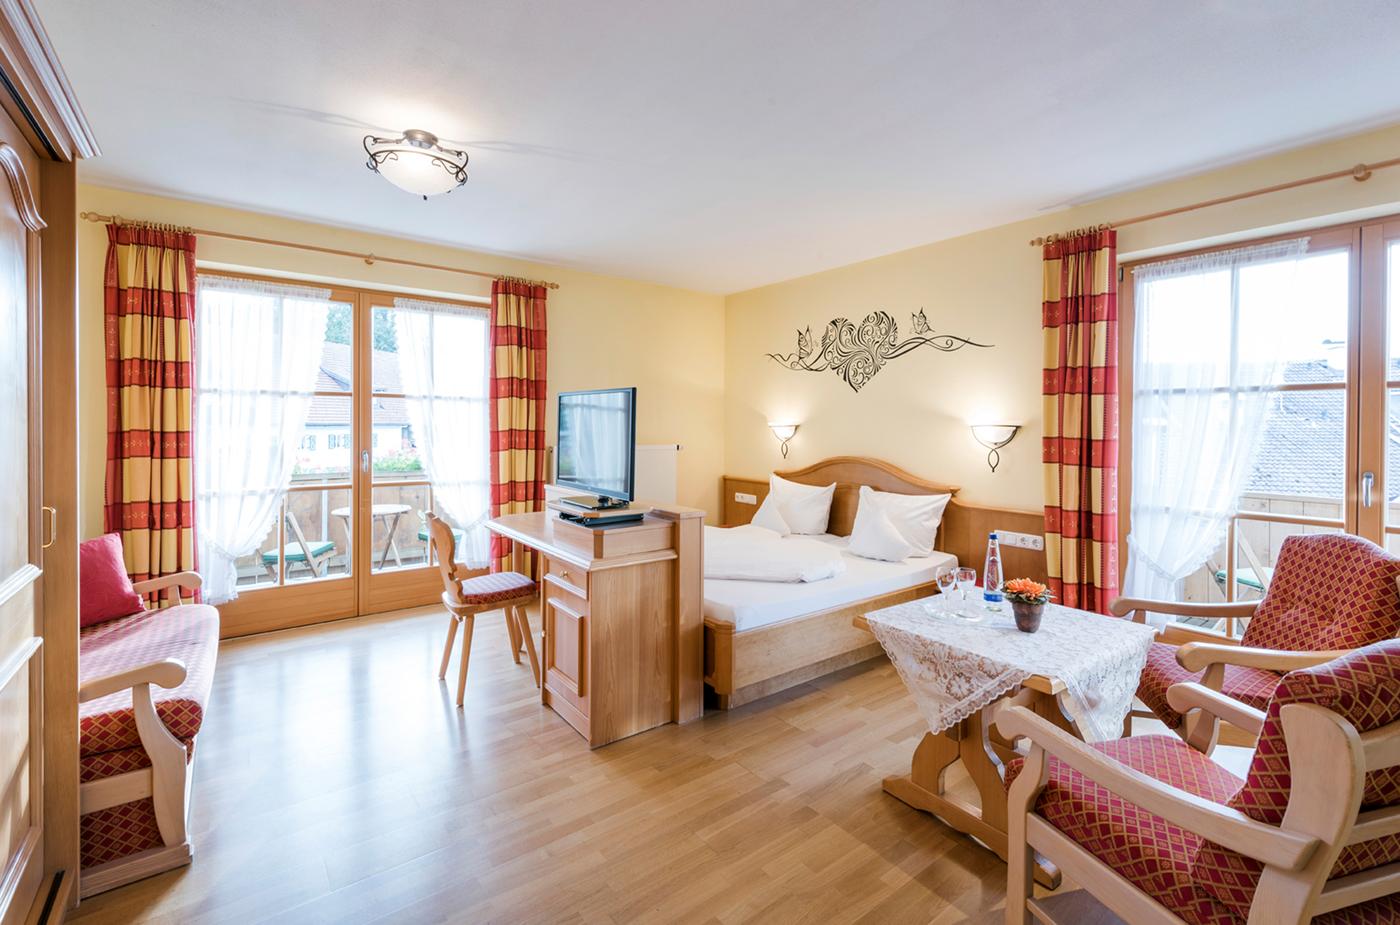 Zimmer Im Hotel Waldruh In Bad Kohlgrub